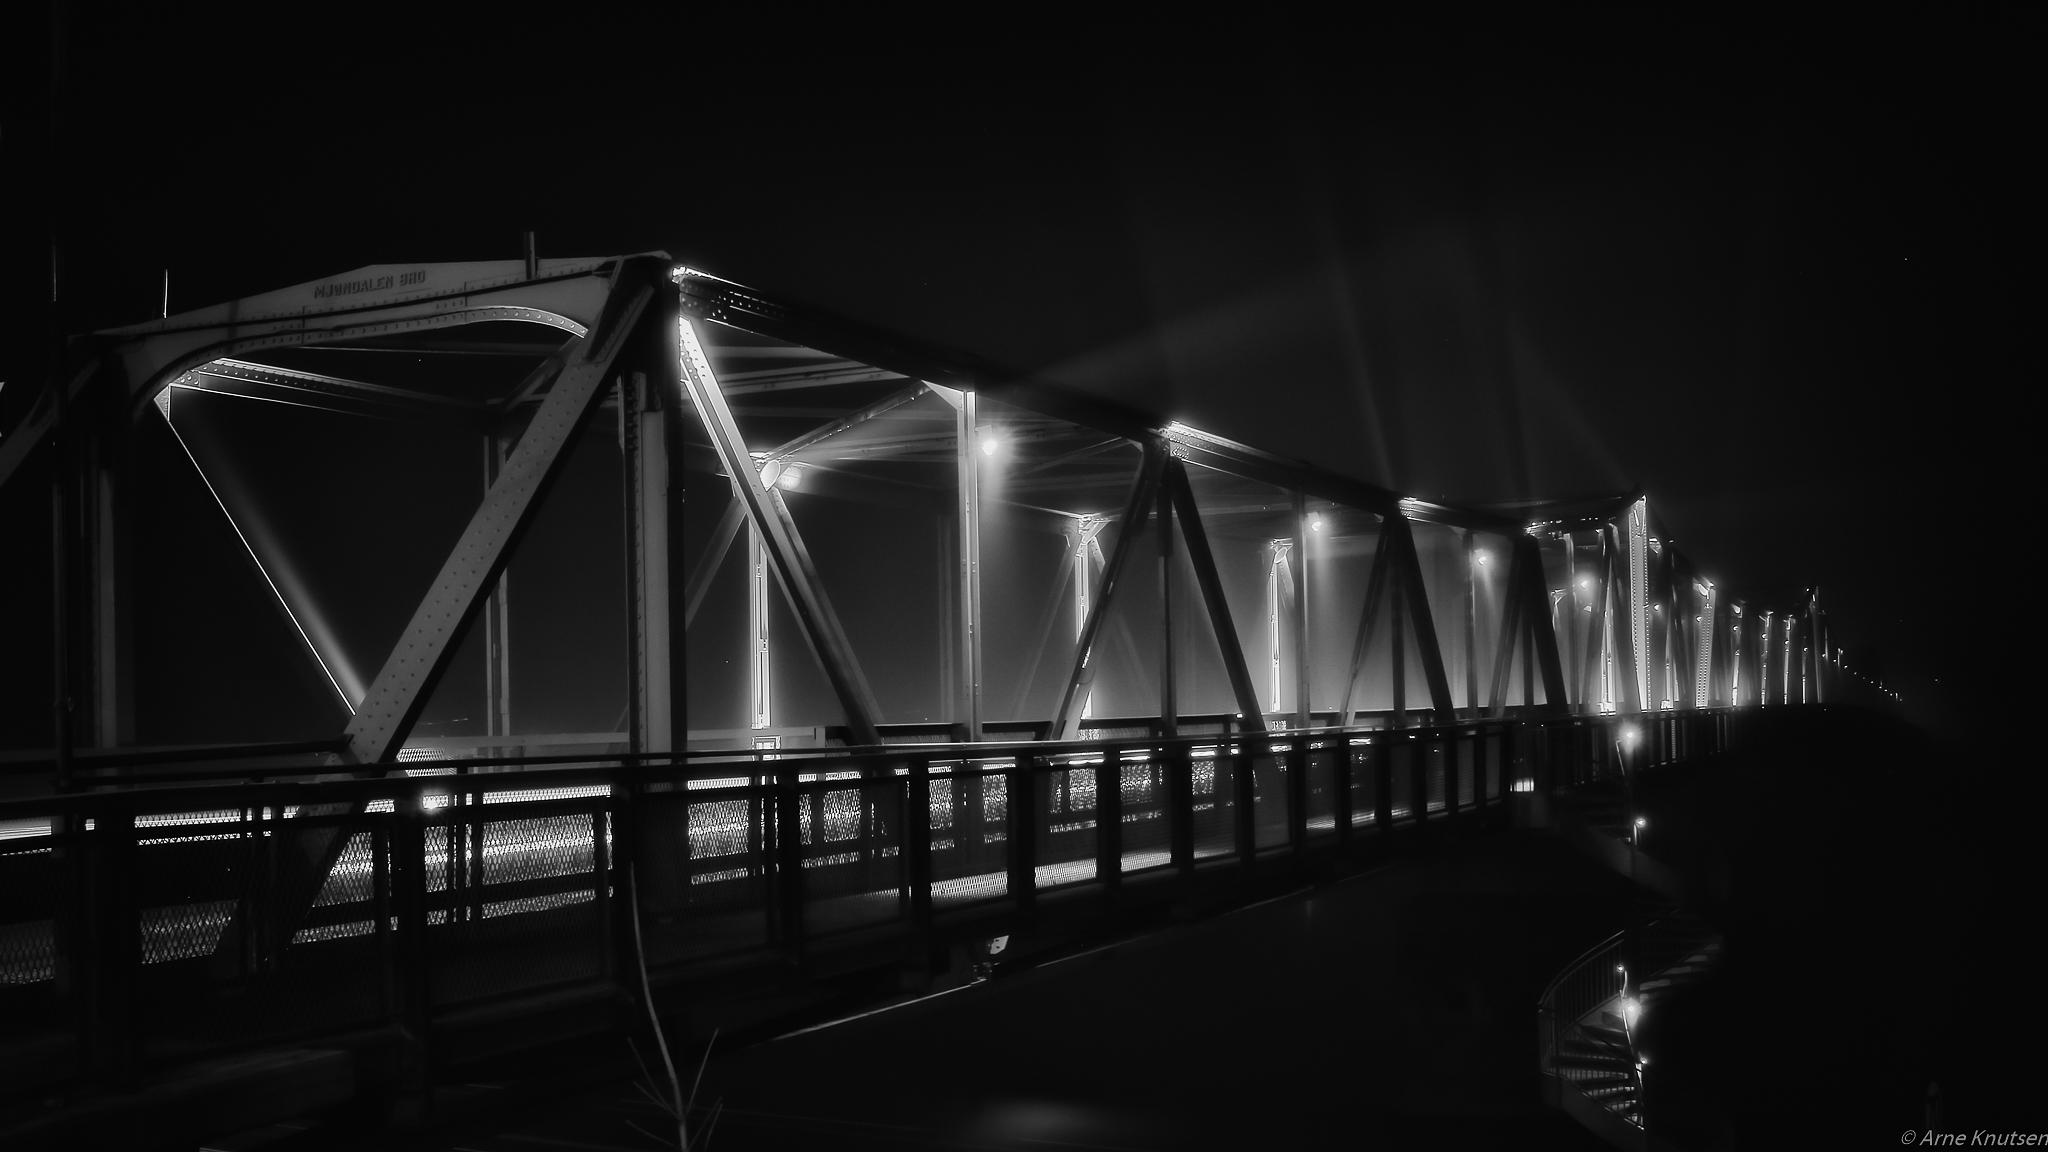 Mjøndalsbroa by Arne Knutsen